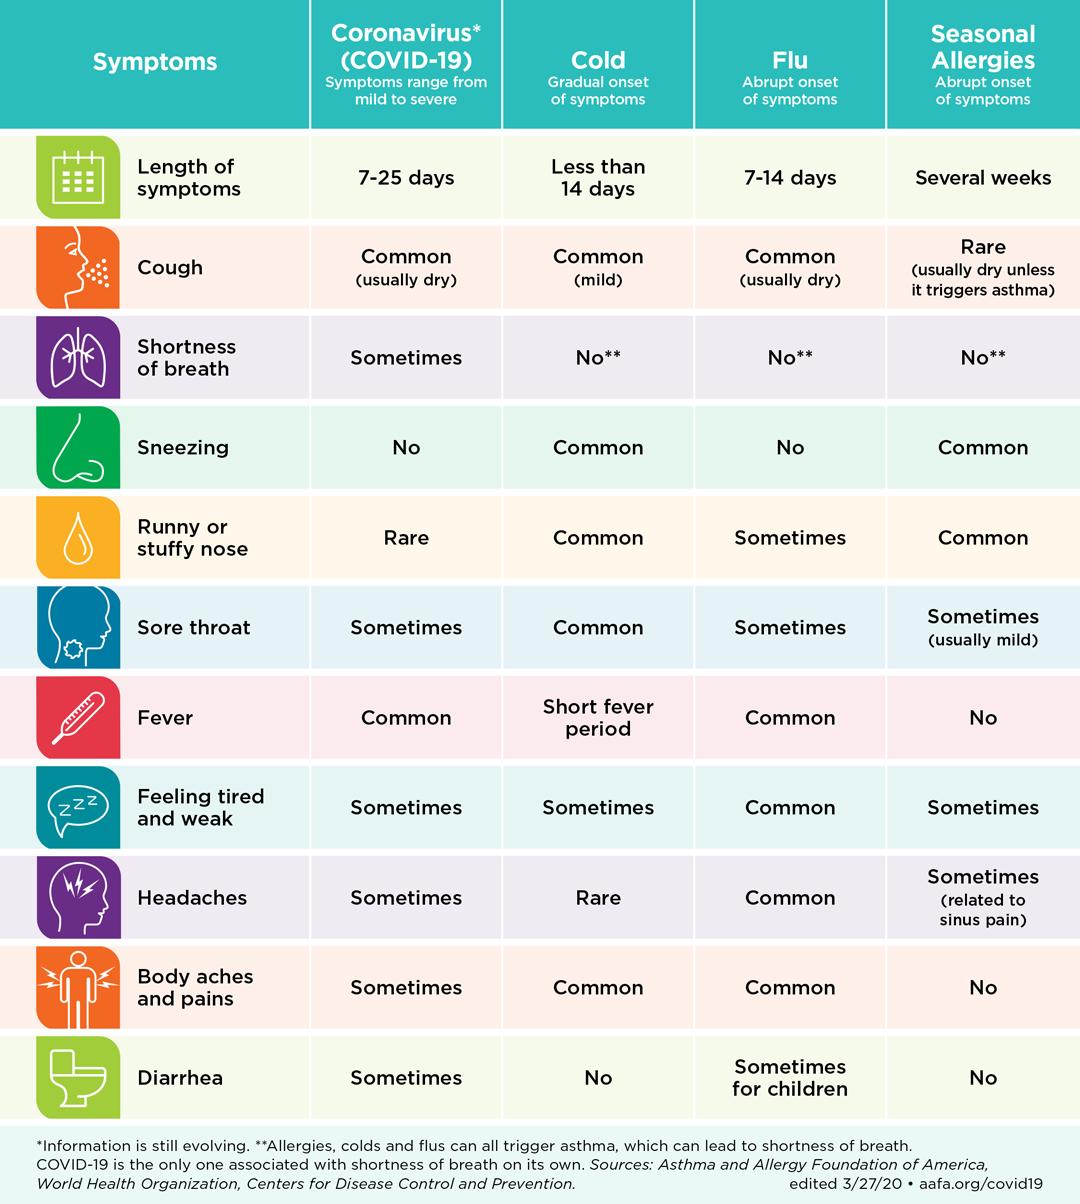 Allergy, coronavirus, cold and flu symptom differences